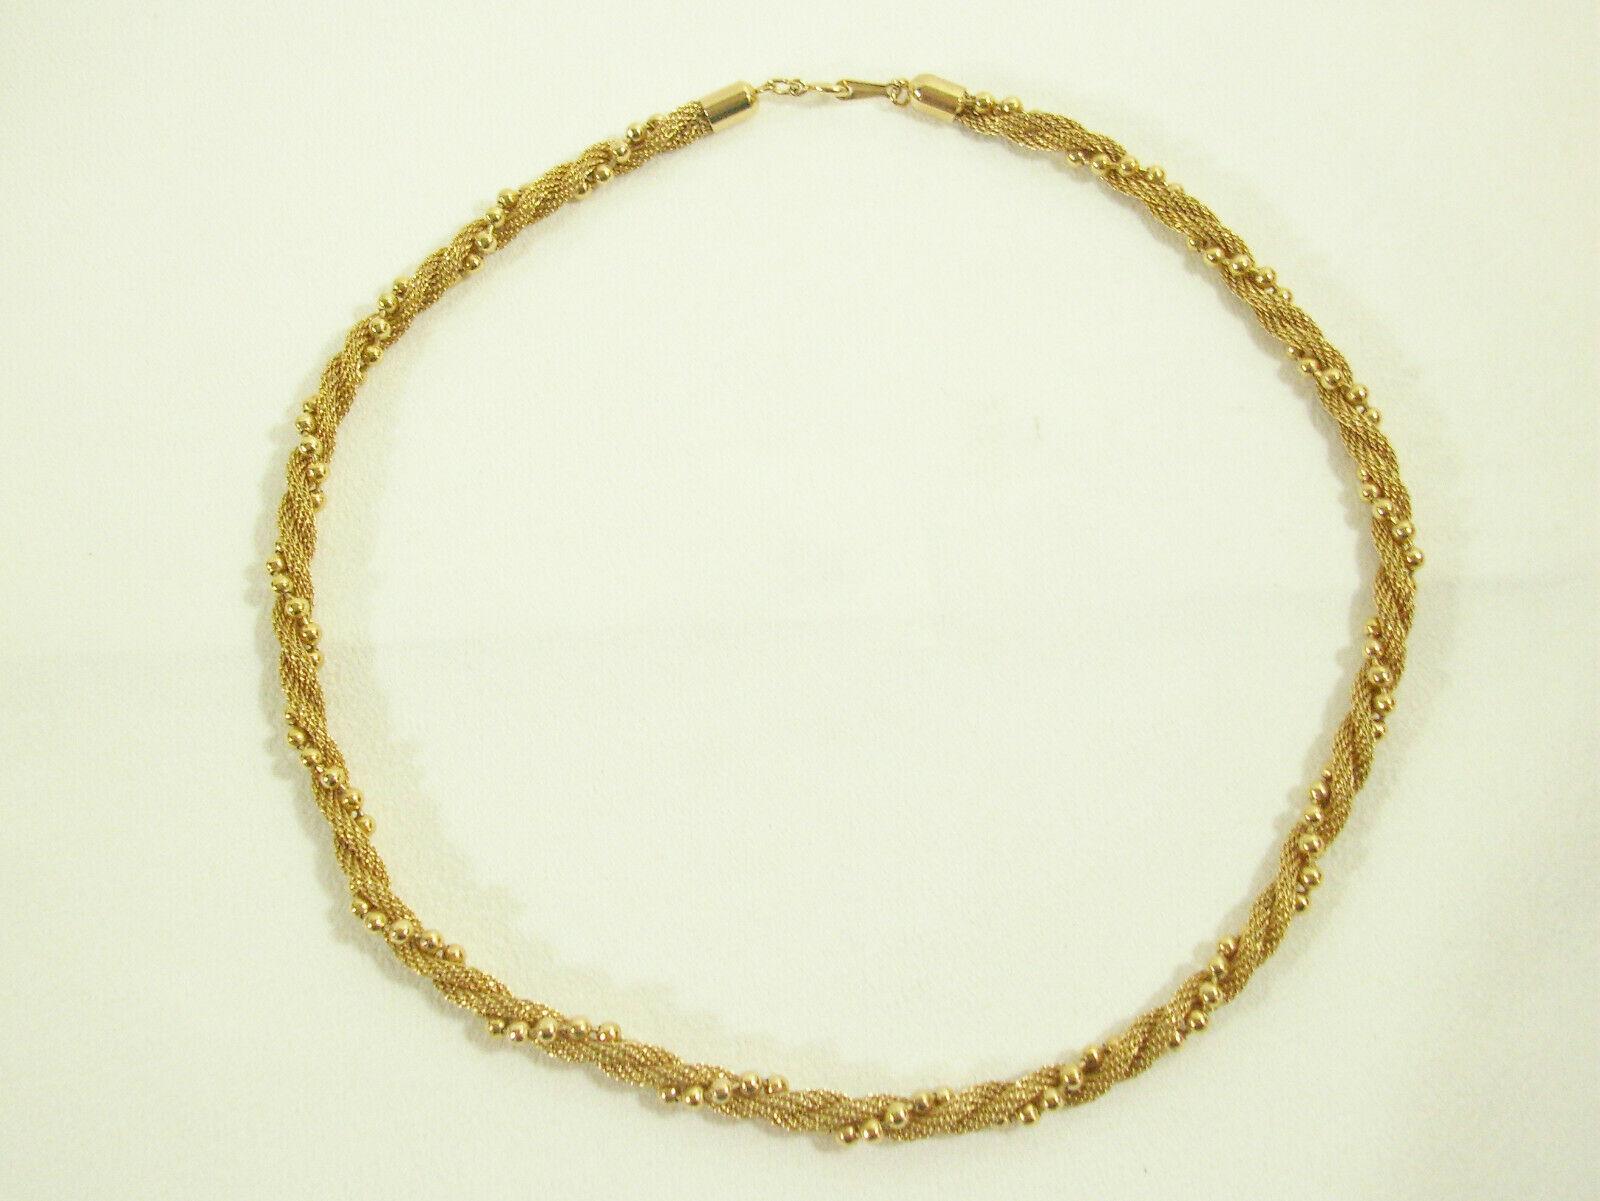 Avon Gold Plate Mesh Twist Ball Chain Choker Necklace Elegant Classic image 4